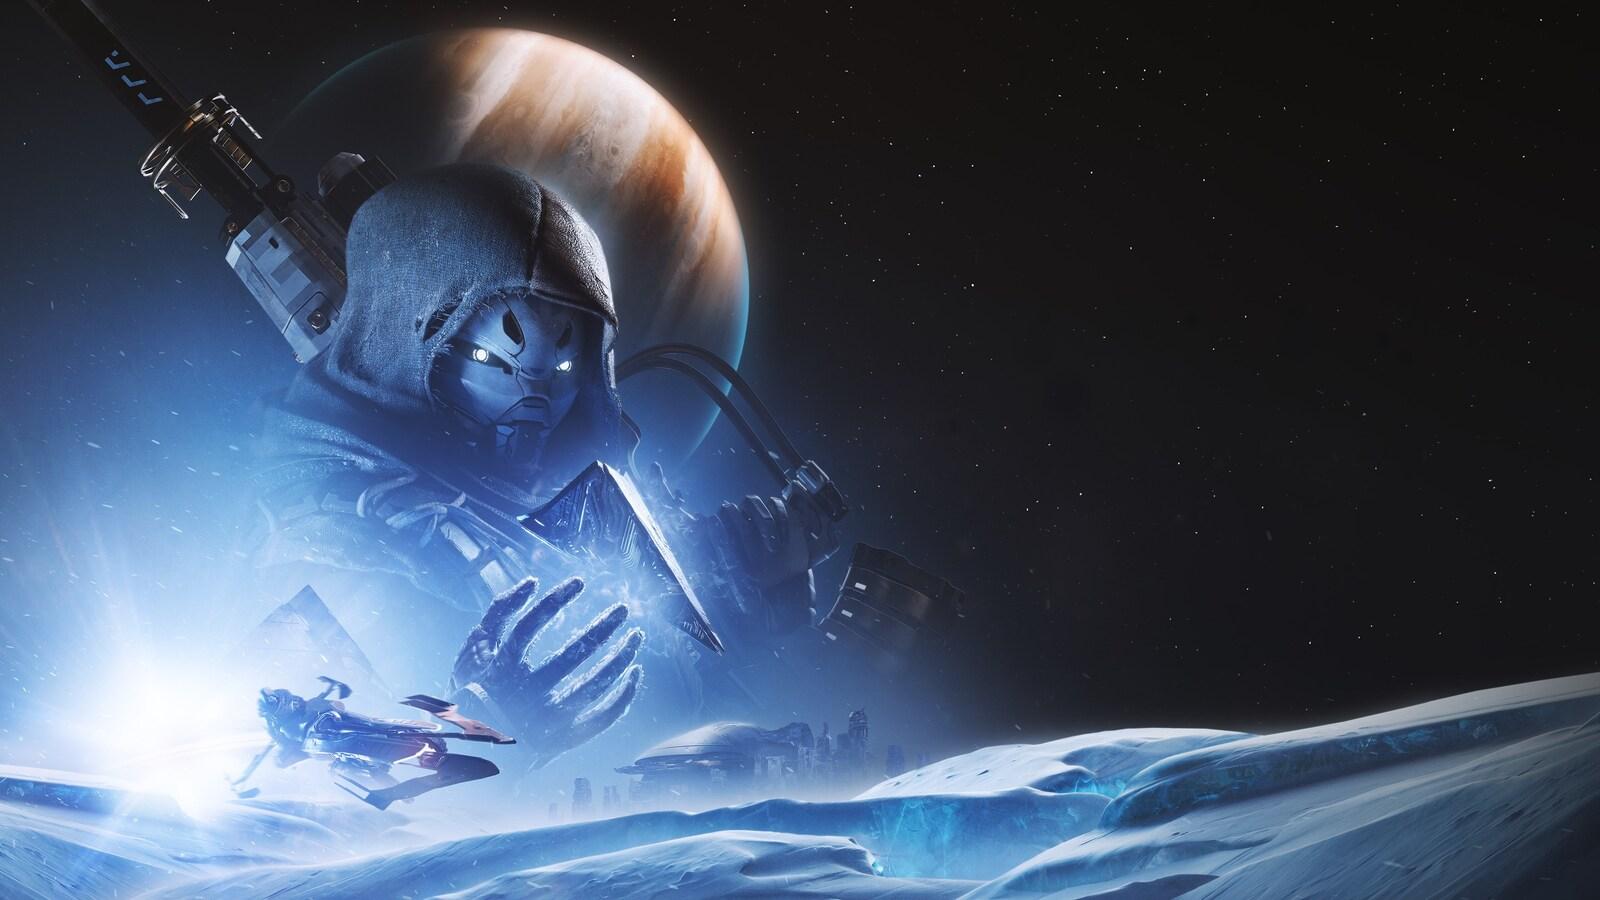 destiny-2-beyond-light-2021-if.jpg